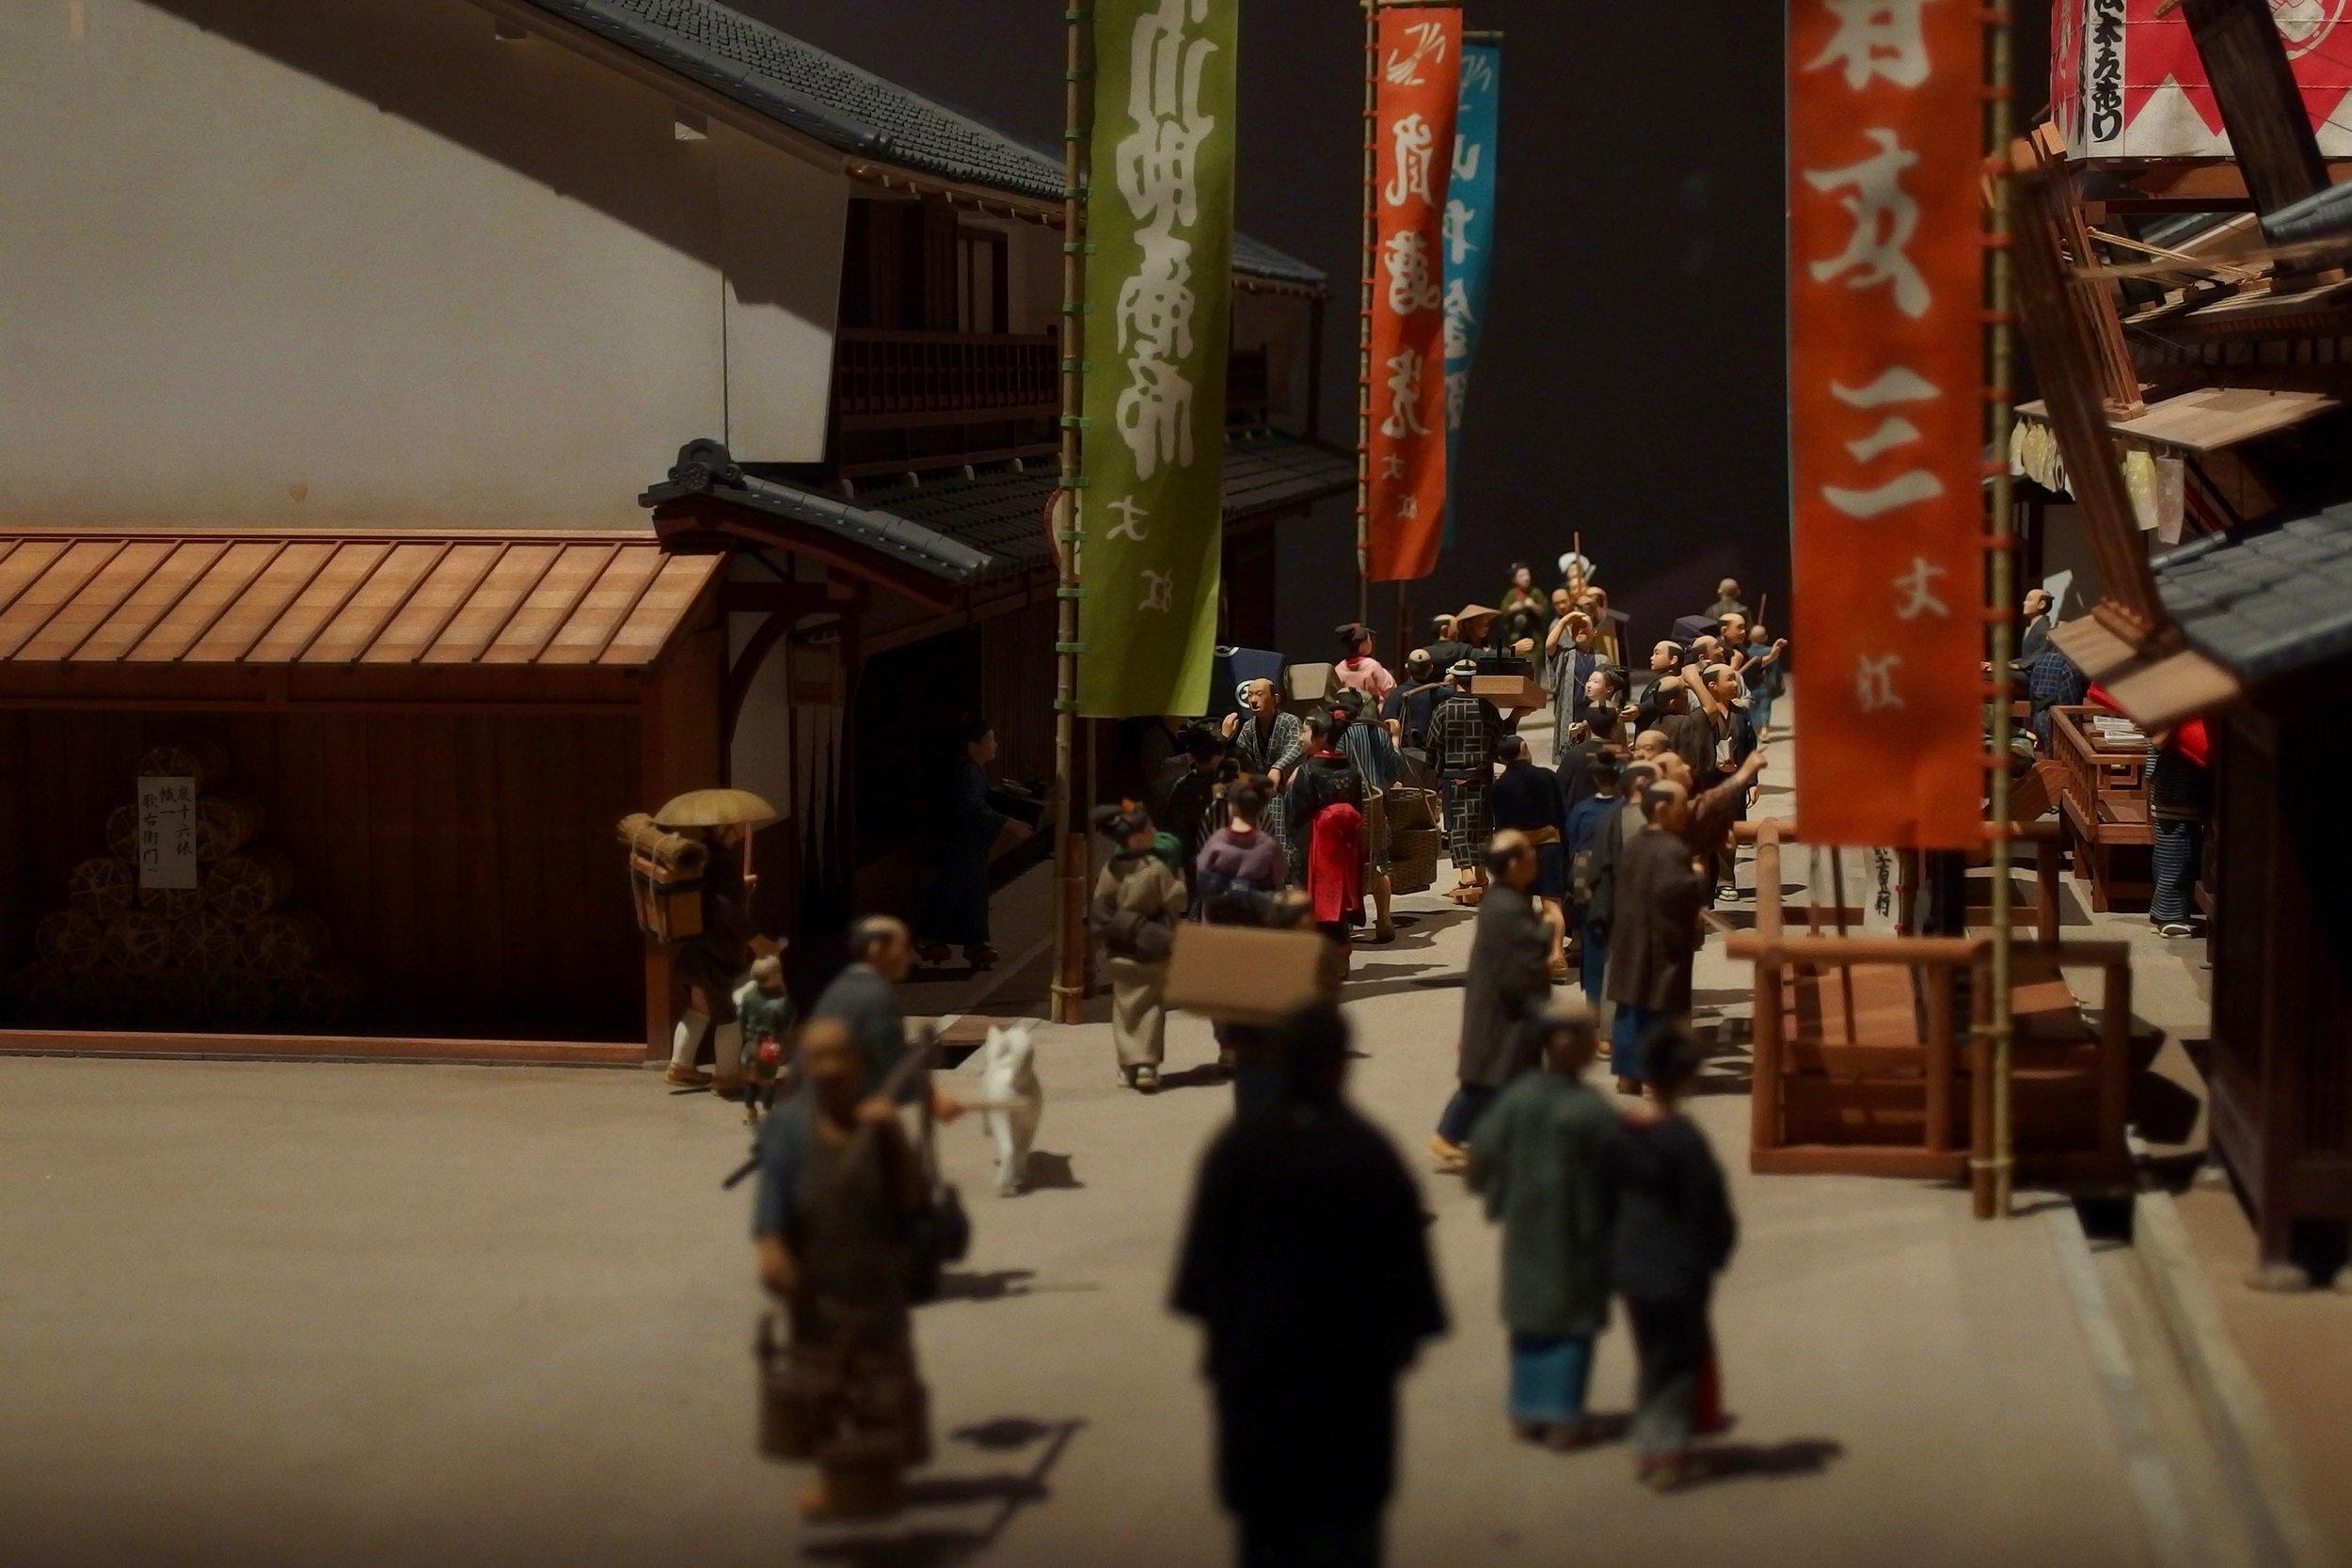 osaka museum of history street scene figures.jpg